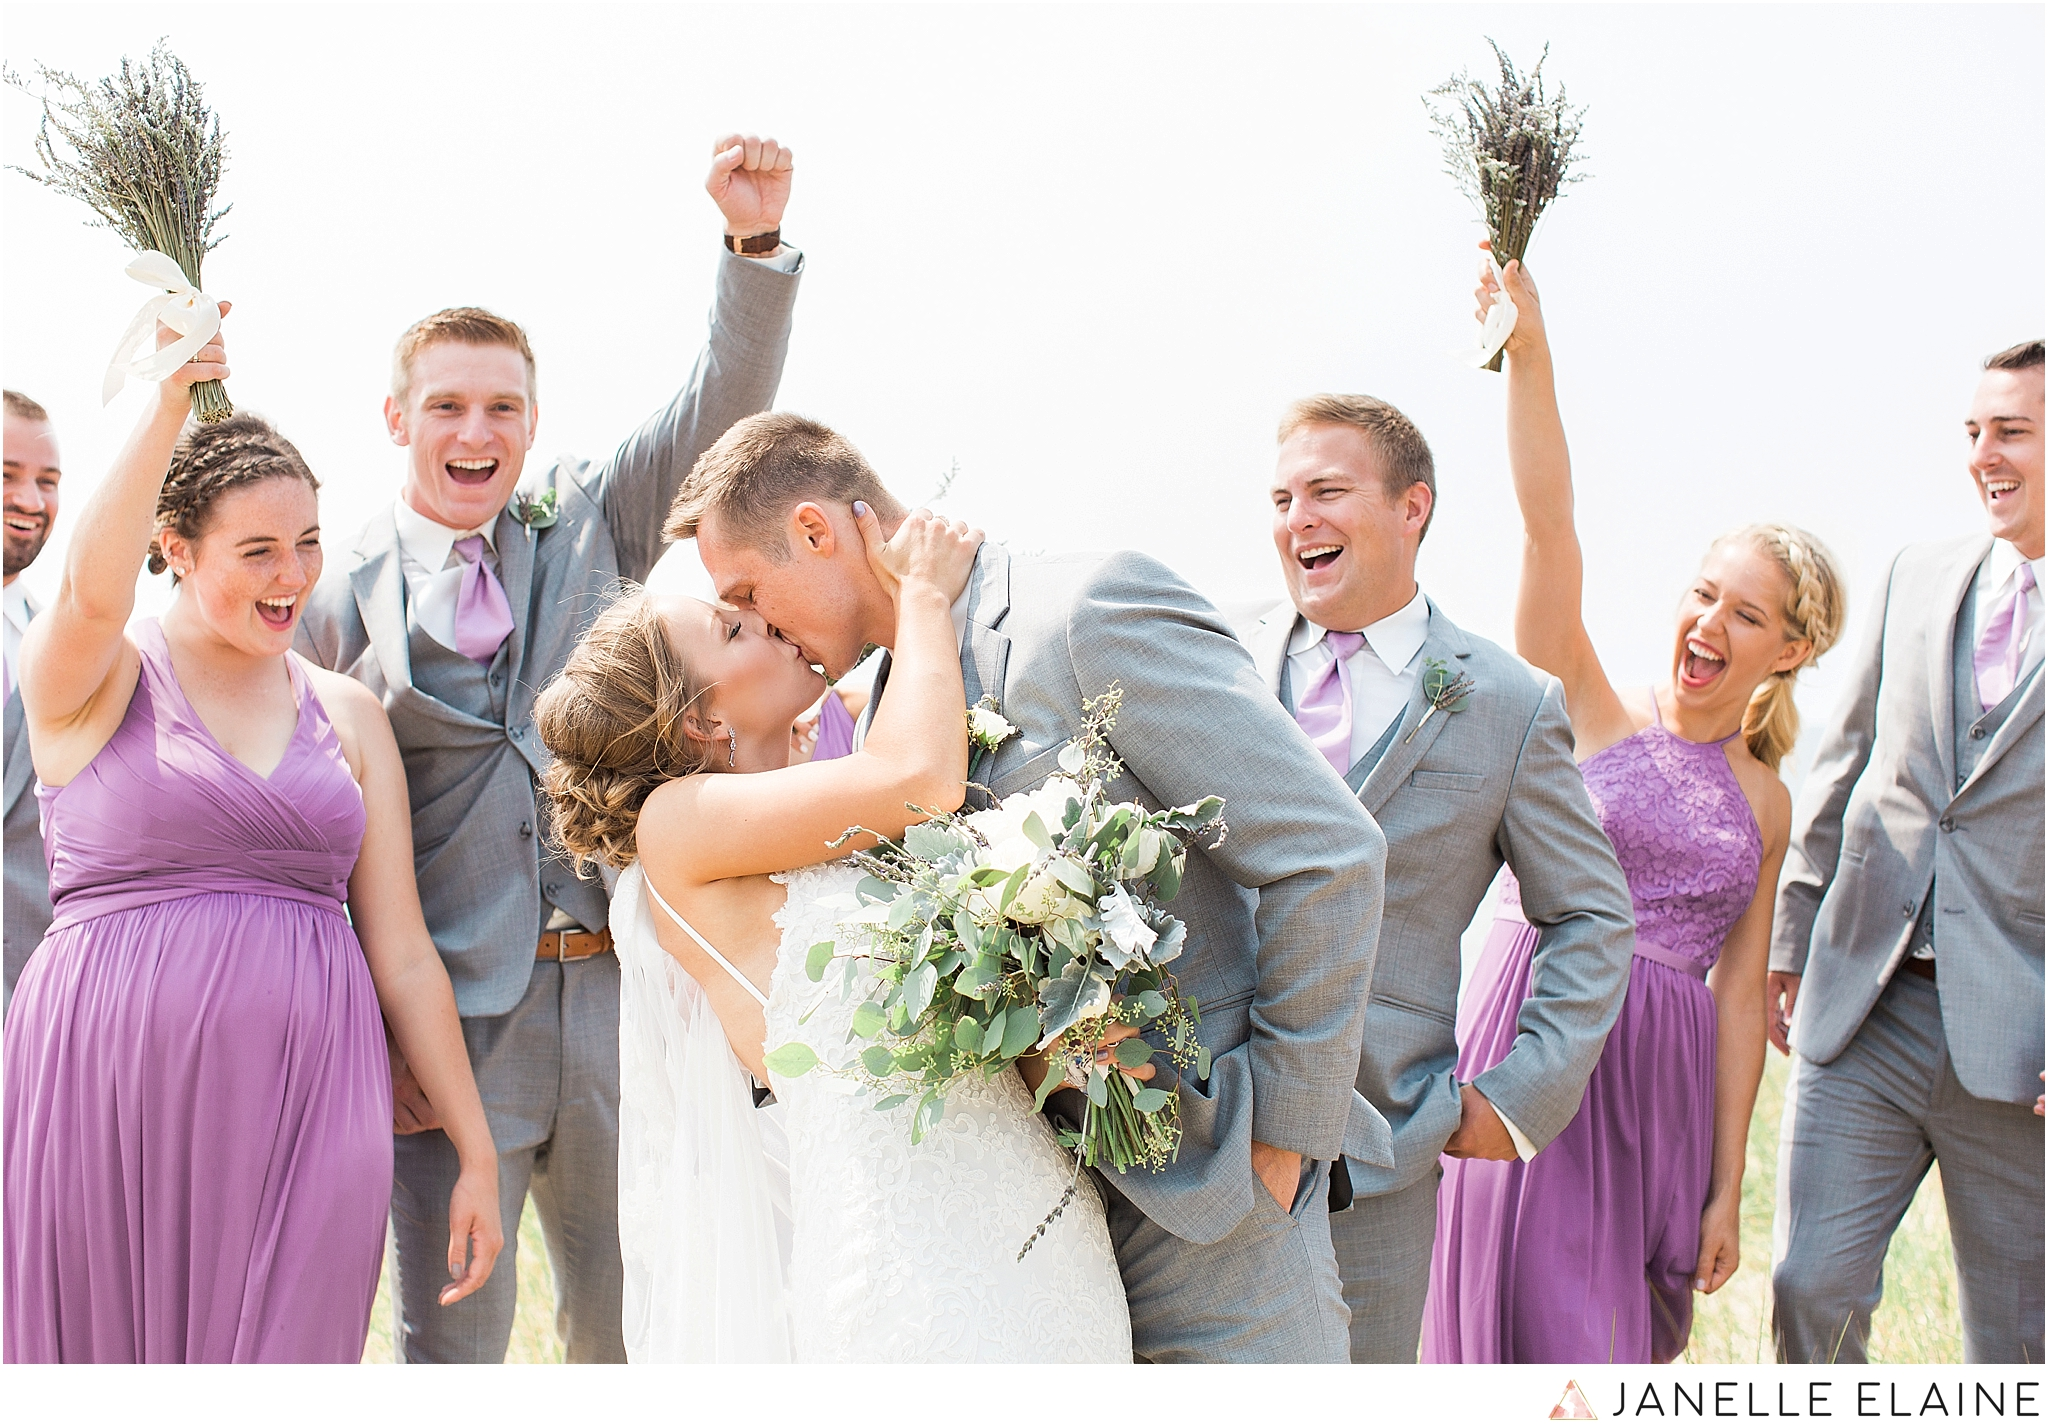 warnsholz-wedding-michigan-photography-janelle elaine photography-86.jpg